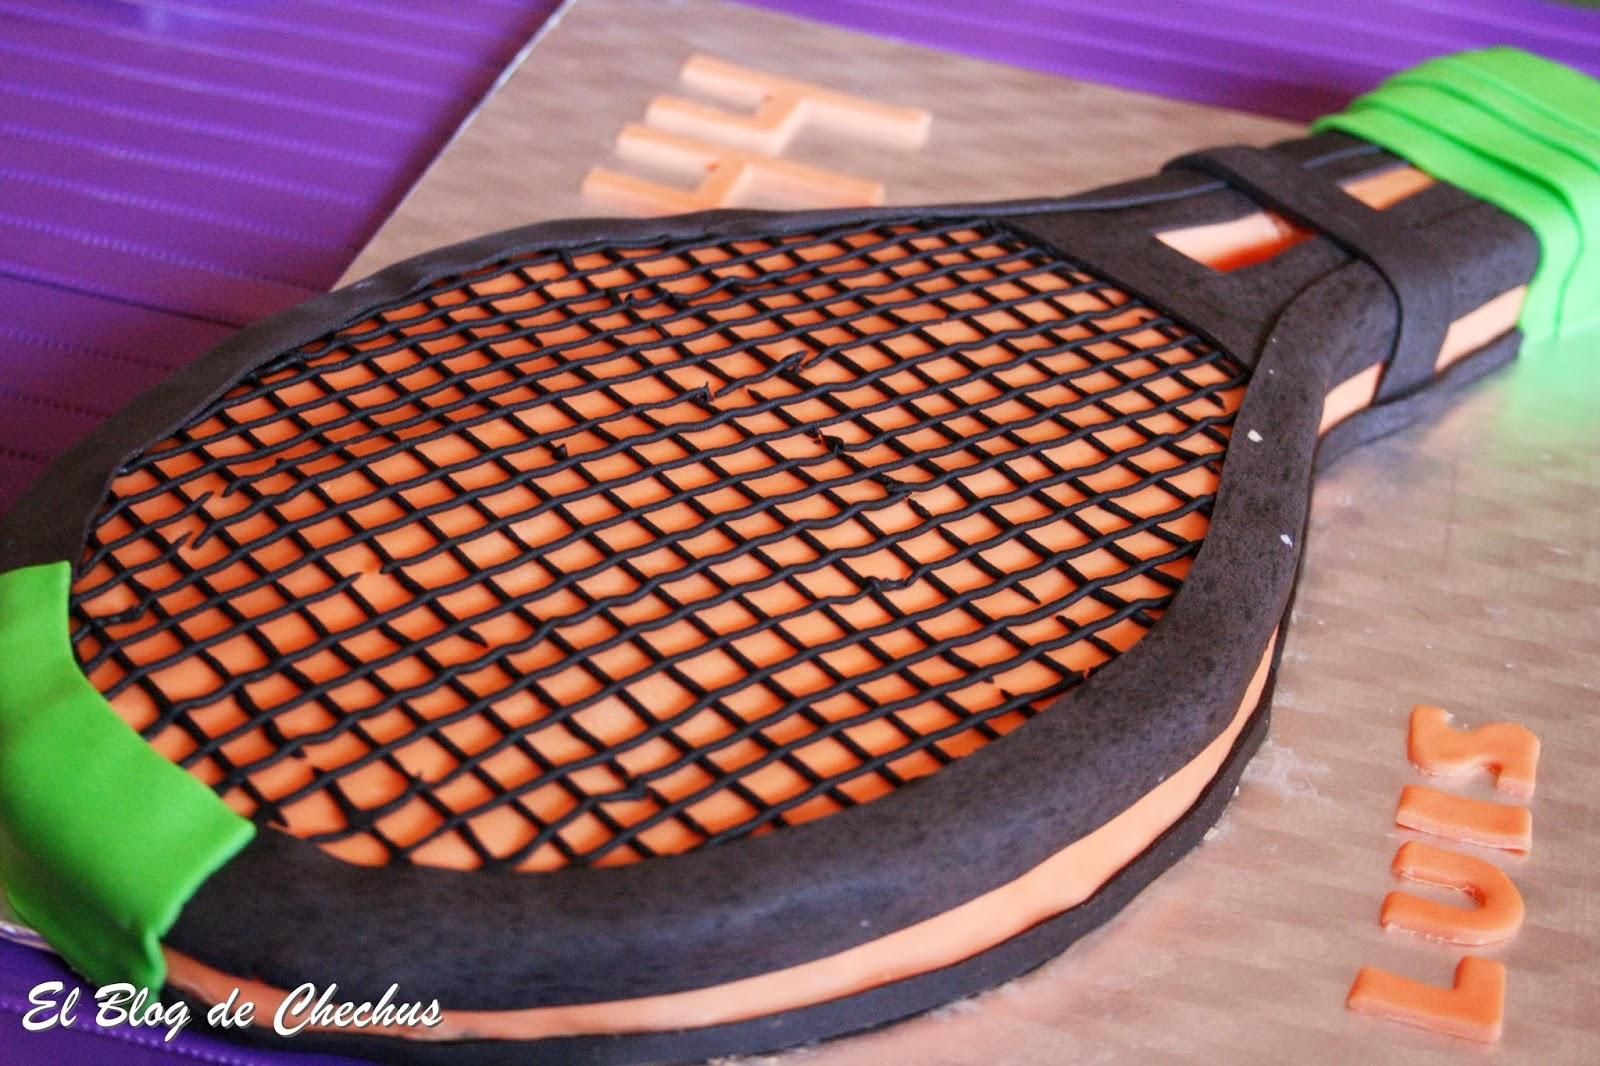 tartas decoradas, tarta raqueta de tenis, el blog de Chechus, Chechus Cupcakes